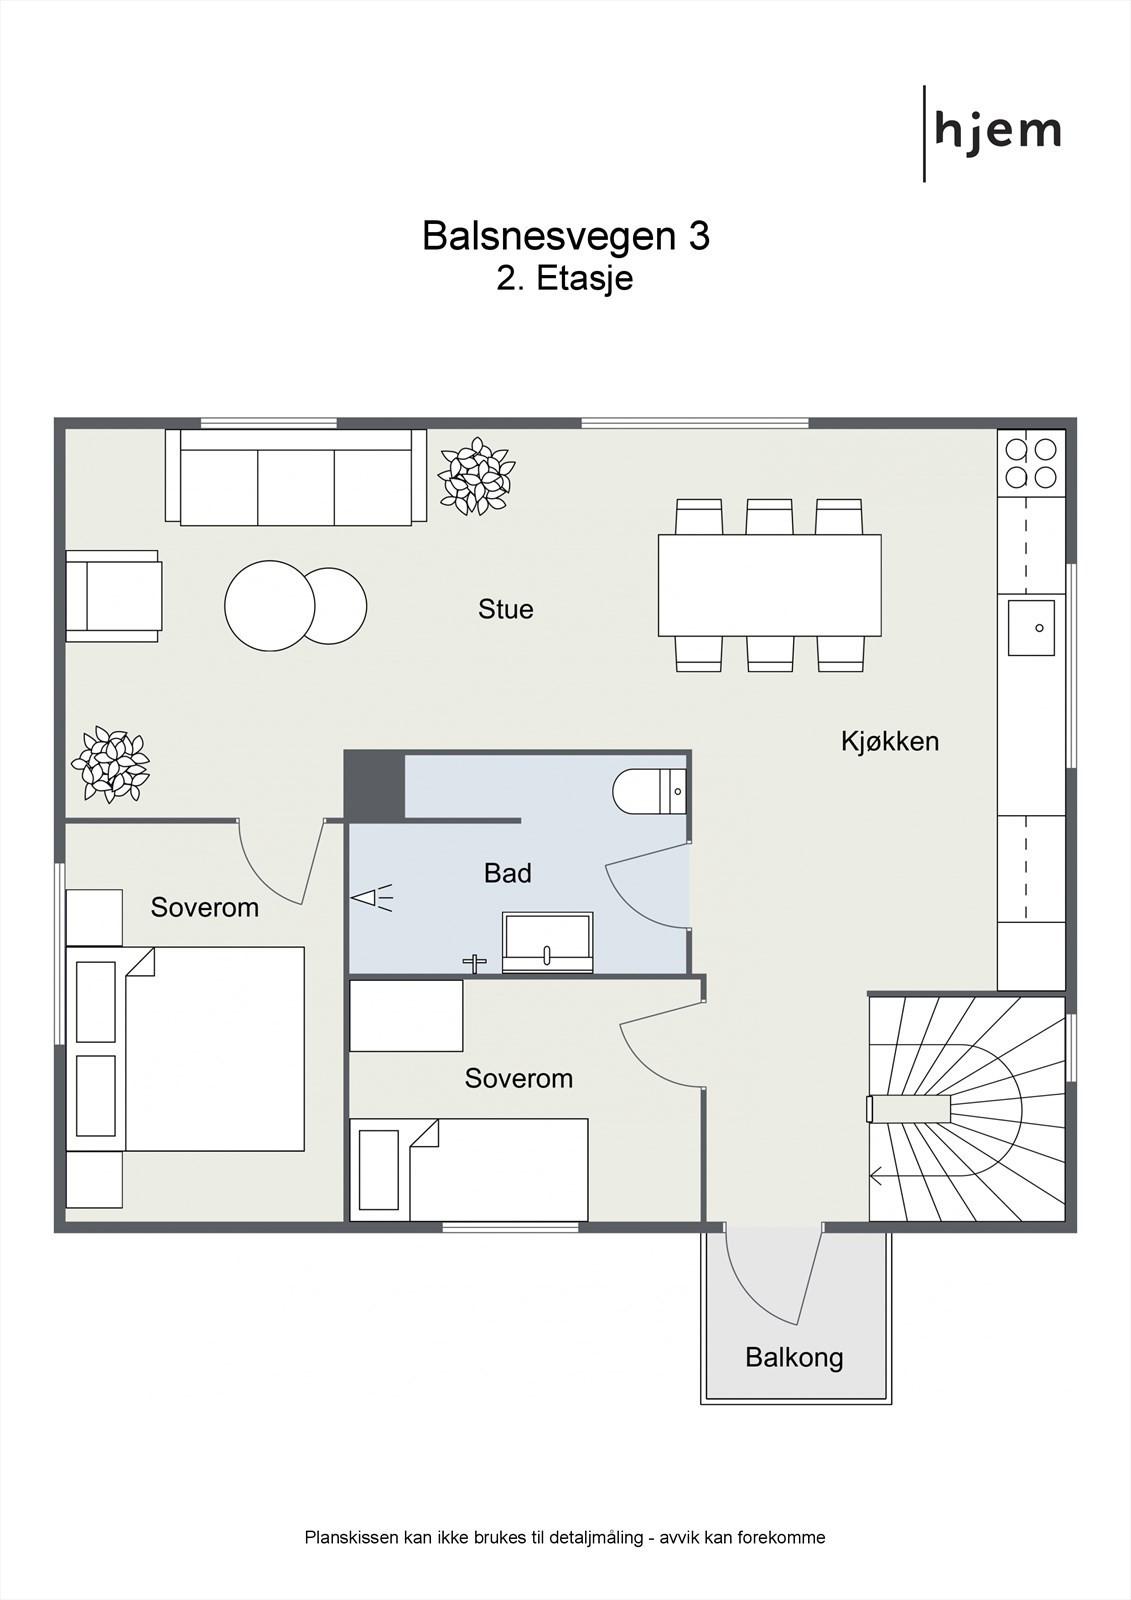 Floorplan letterhead - Balsnesvegen 3 - 2. Etasje - 2D Floor Plan.jpg